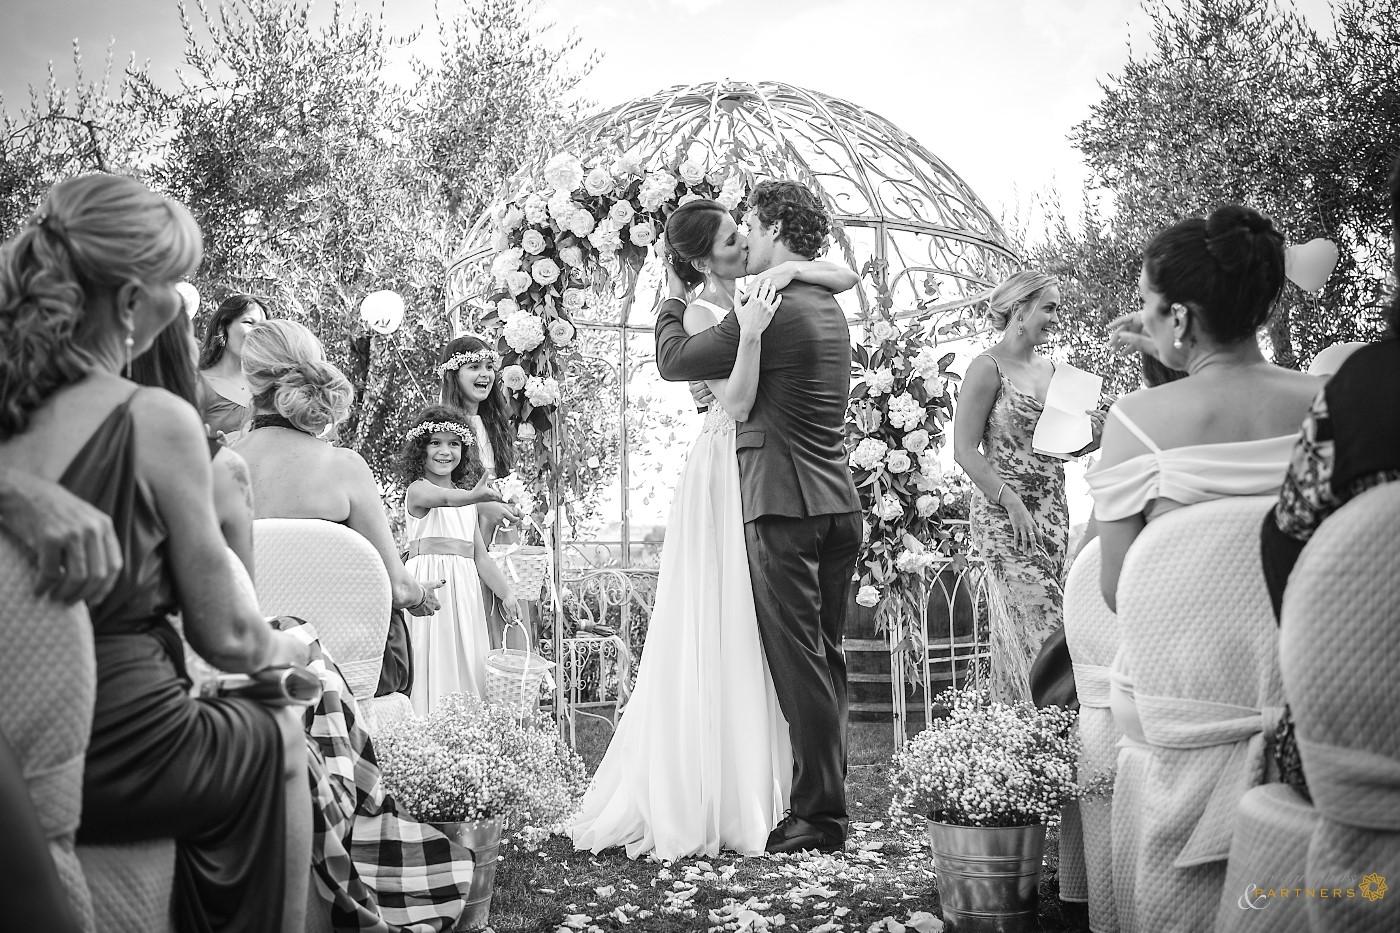 photographer_weddings_montepulciano_09.jpg